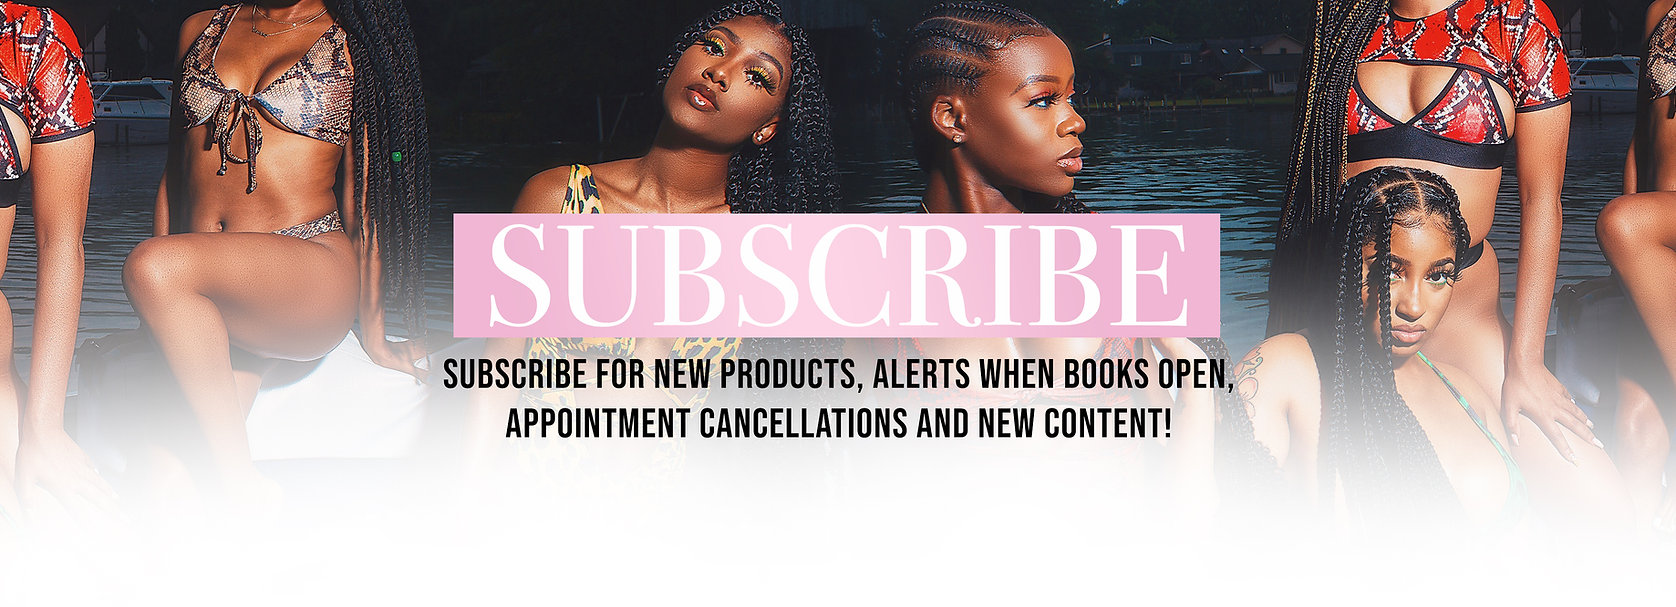 subscribe1.jpg